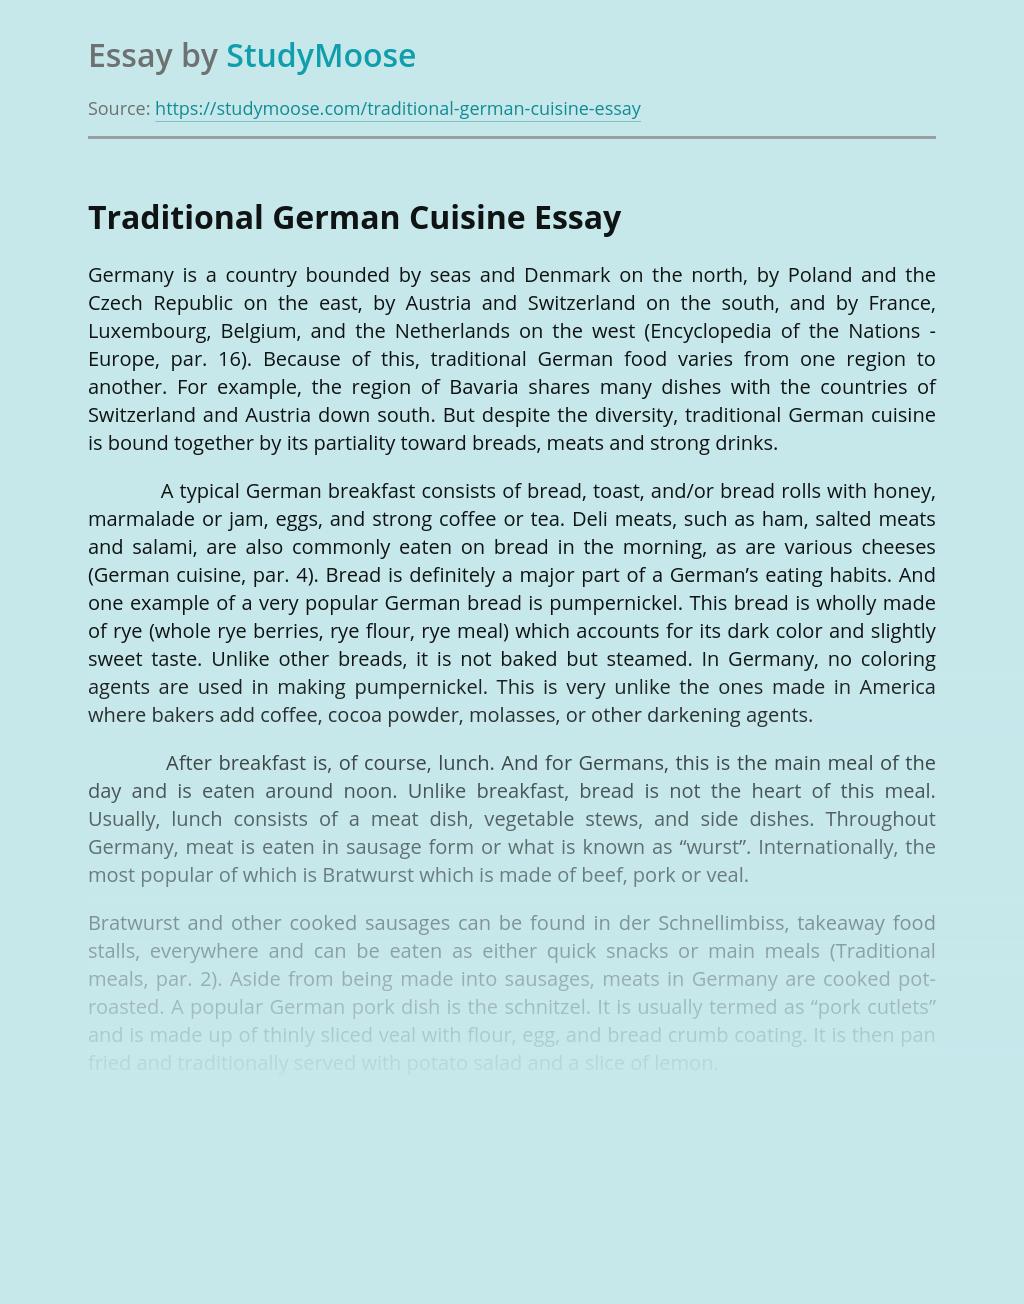 Traditional German Cuisine